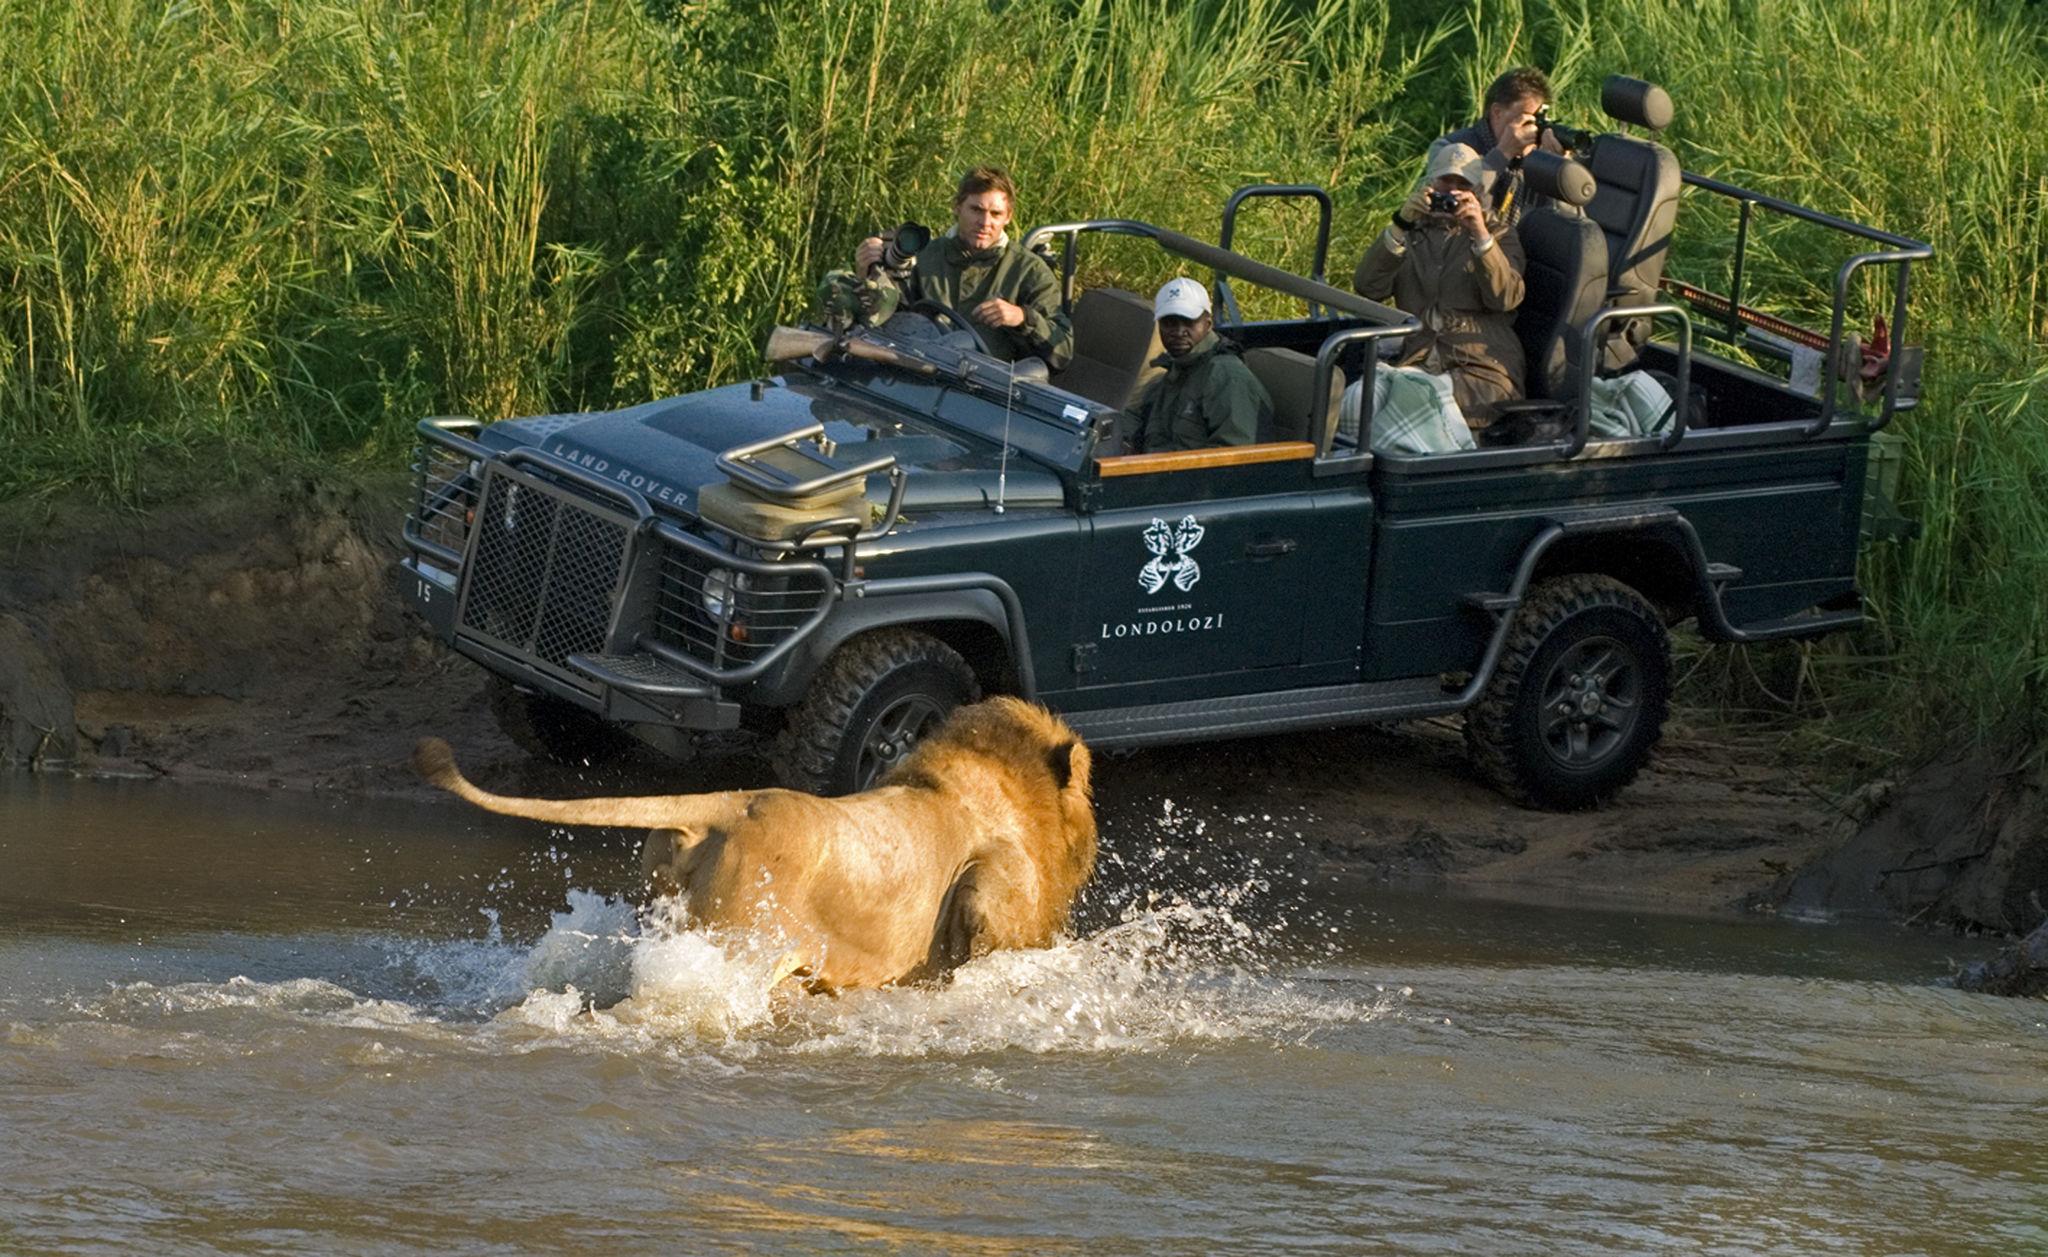 londolozi-activities-photographic-safari-01